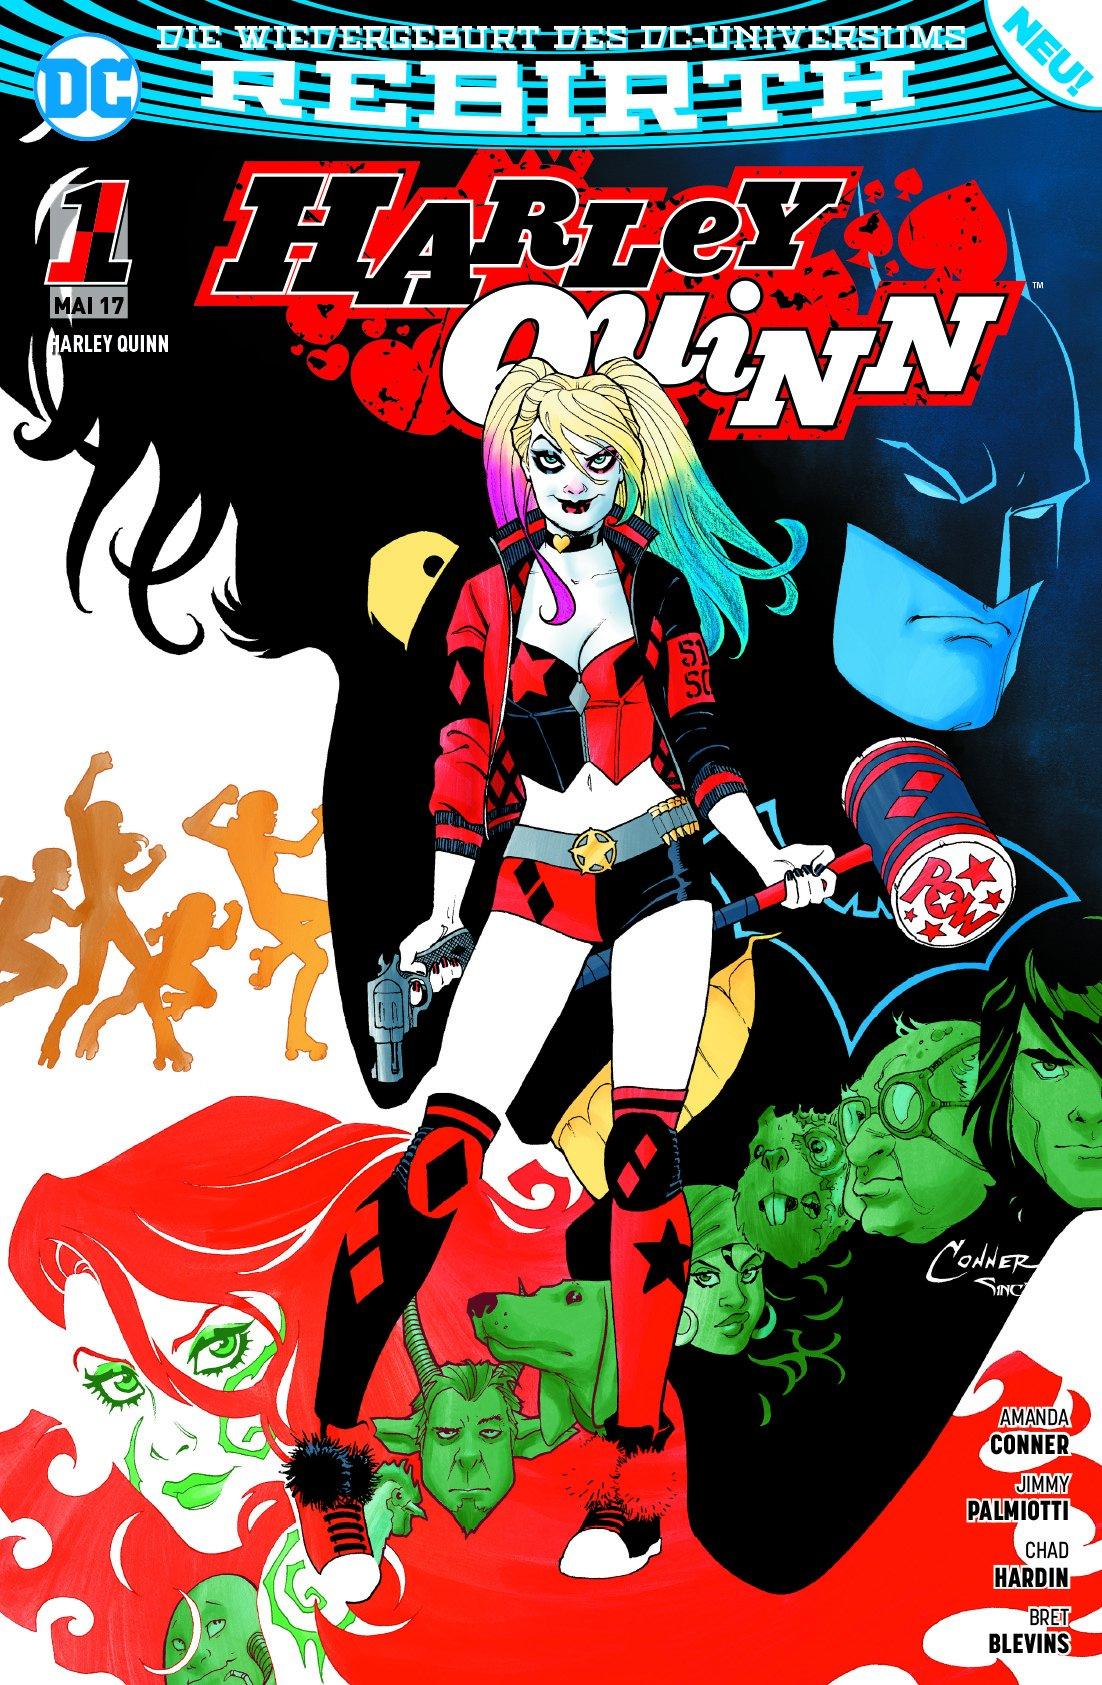 Harley Quinn: Bd. 1 (2. Serie): Zombie-Attacke